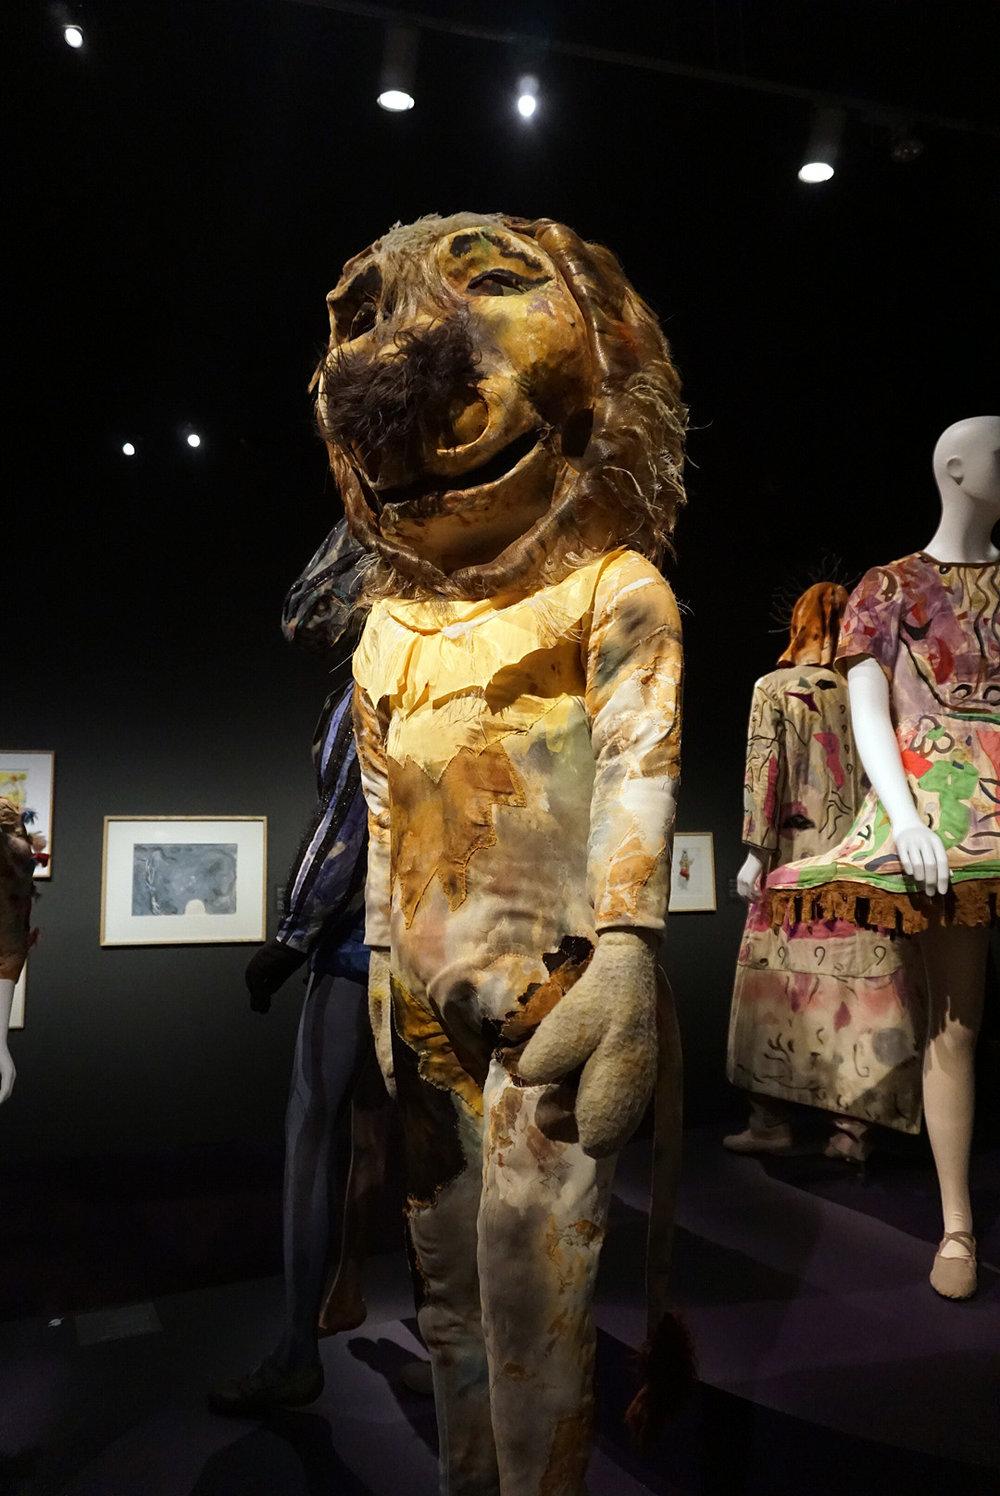 Montreal-Museum-Of-Fine-Art-Canada-Travel-Blogger-Photography-LINDATENCHITRAN-31-1616x1080.jpg